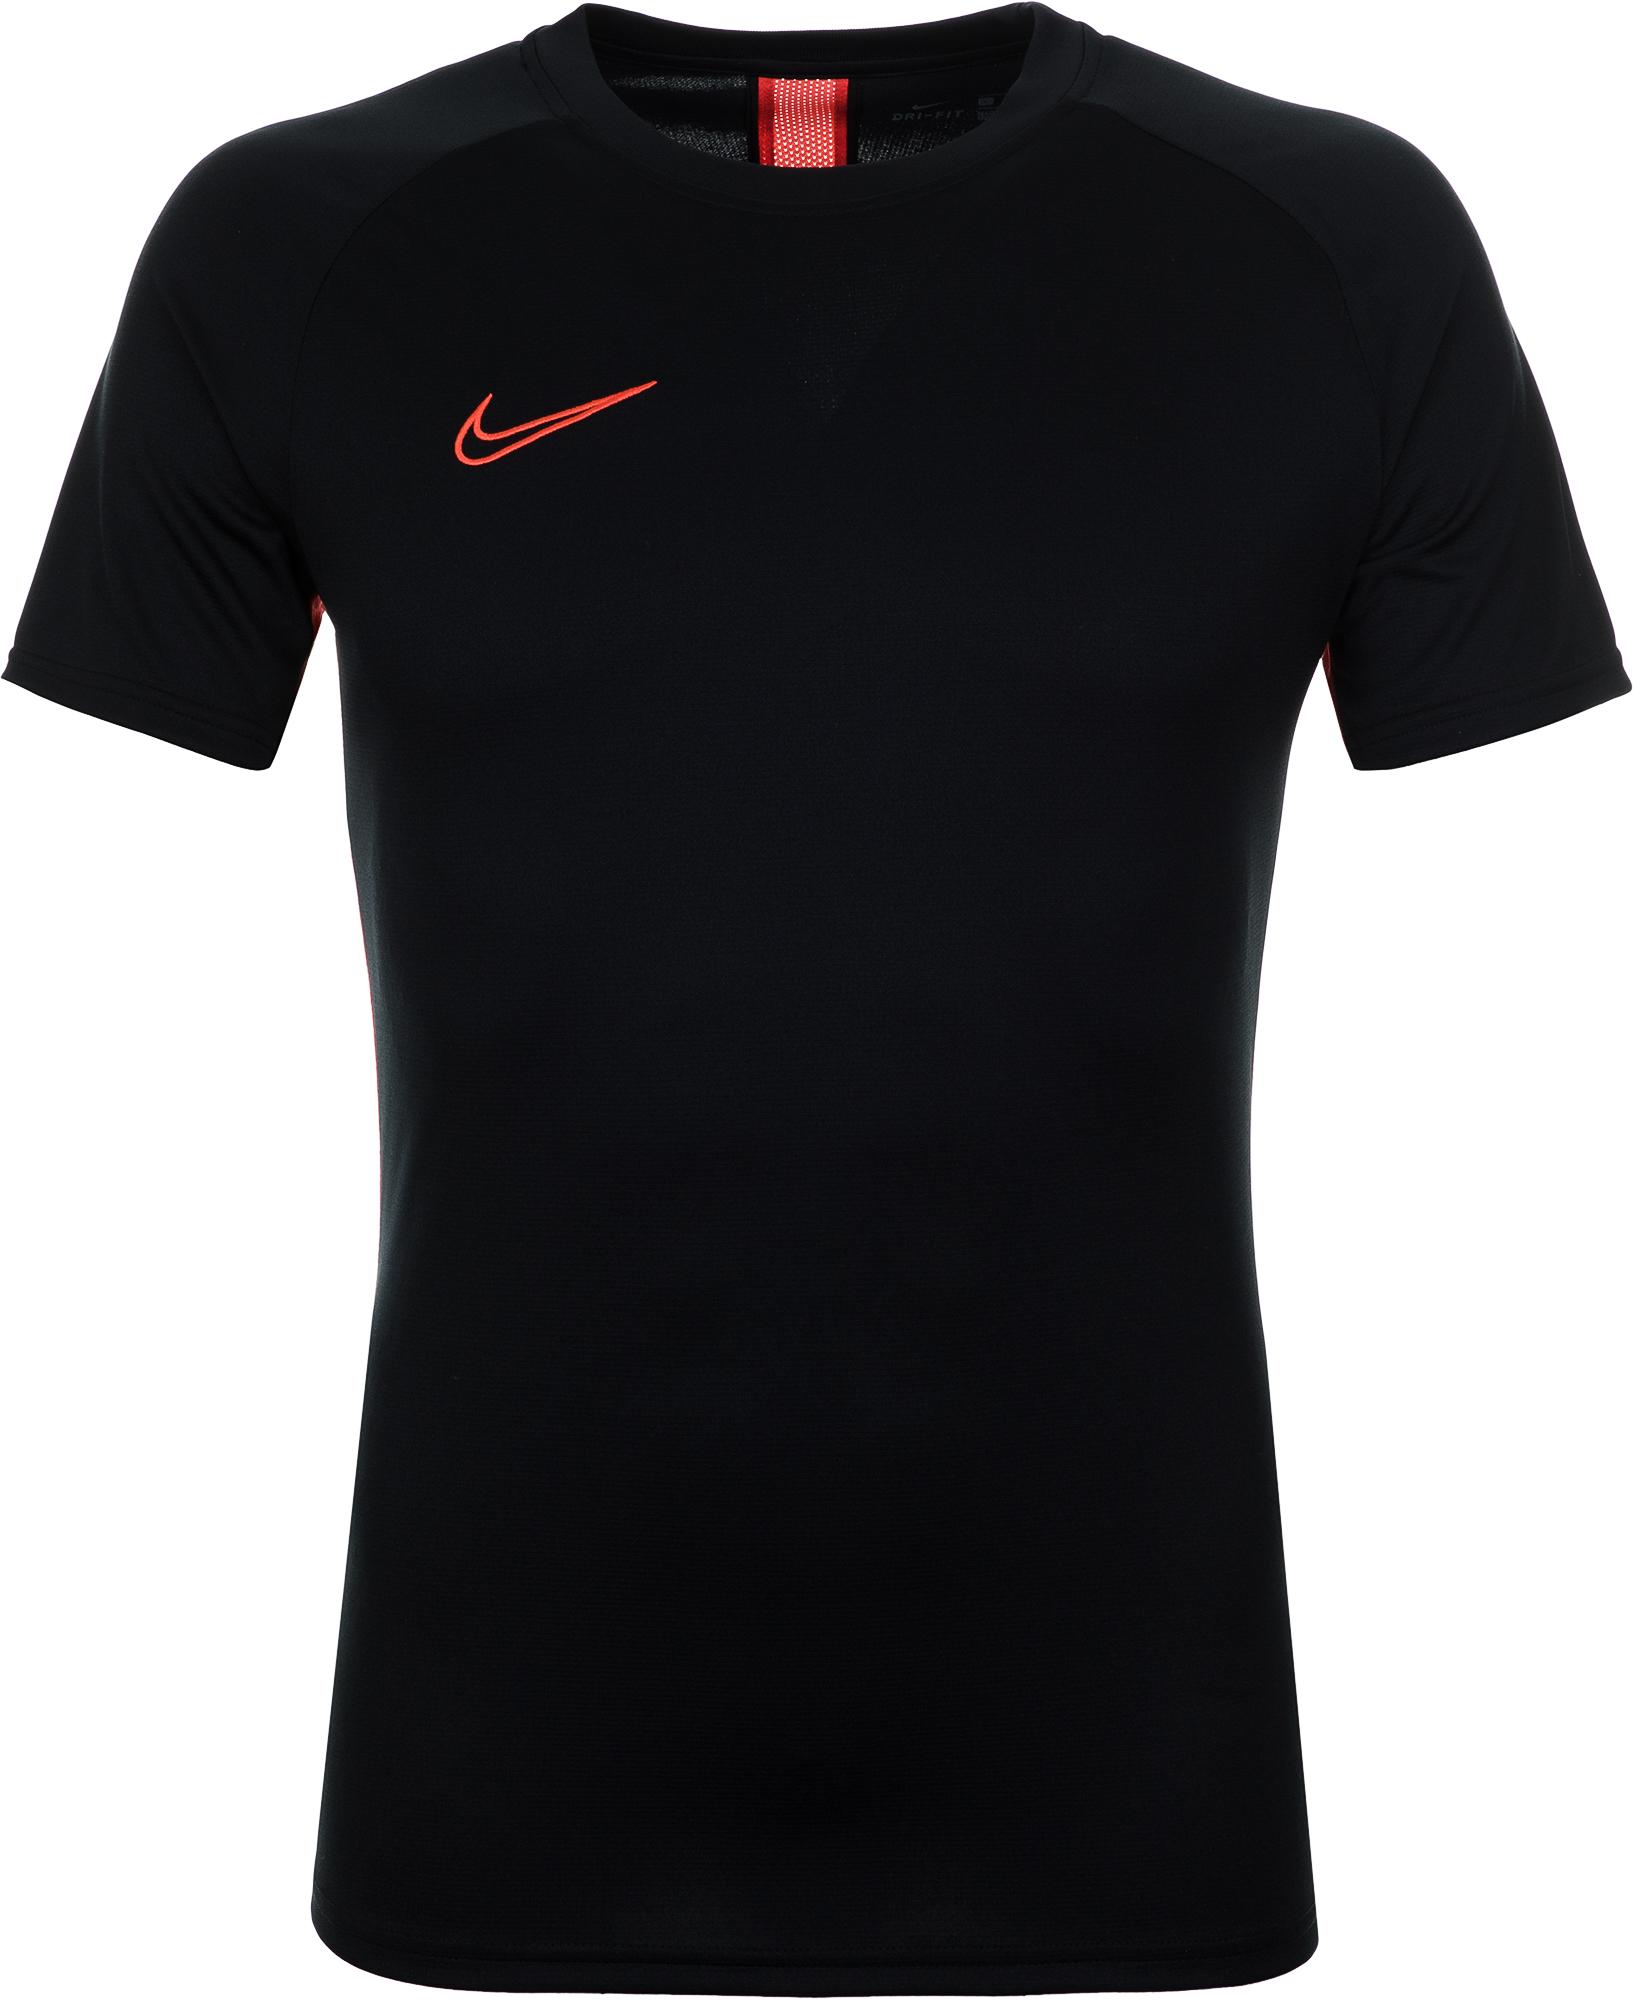 Фото Nike Футболка мужская Nike Academy, размер 46-48